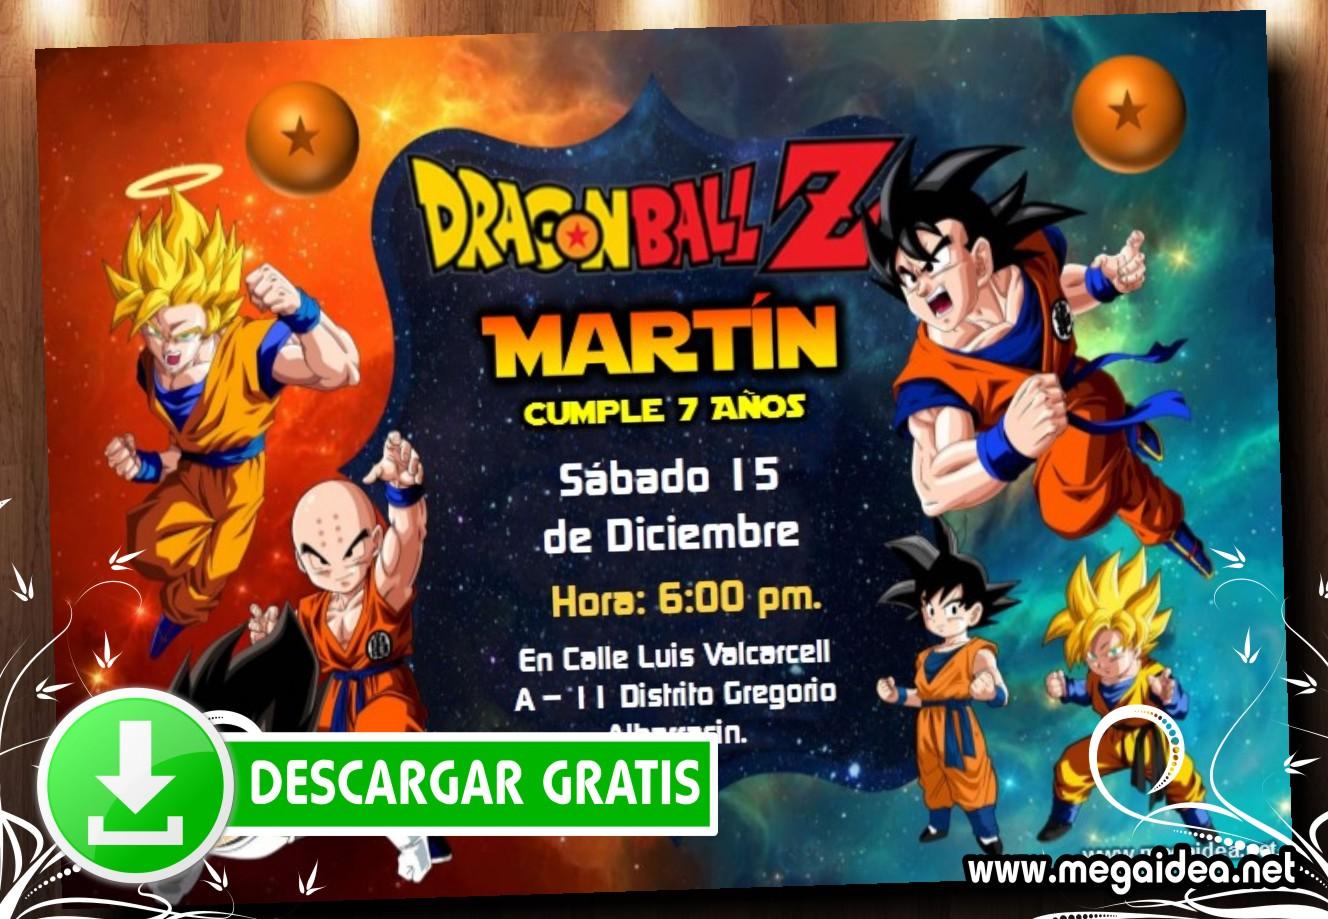 Dragon Ball Z invitacion